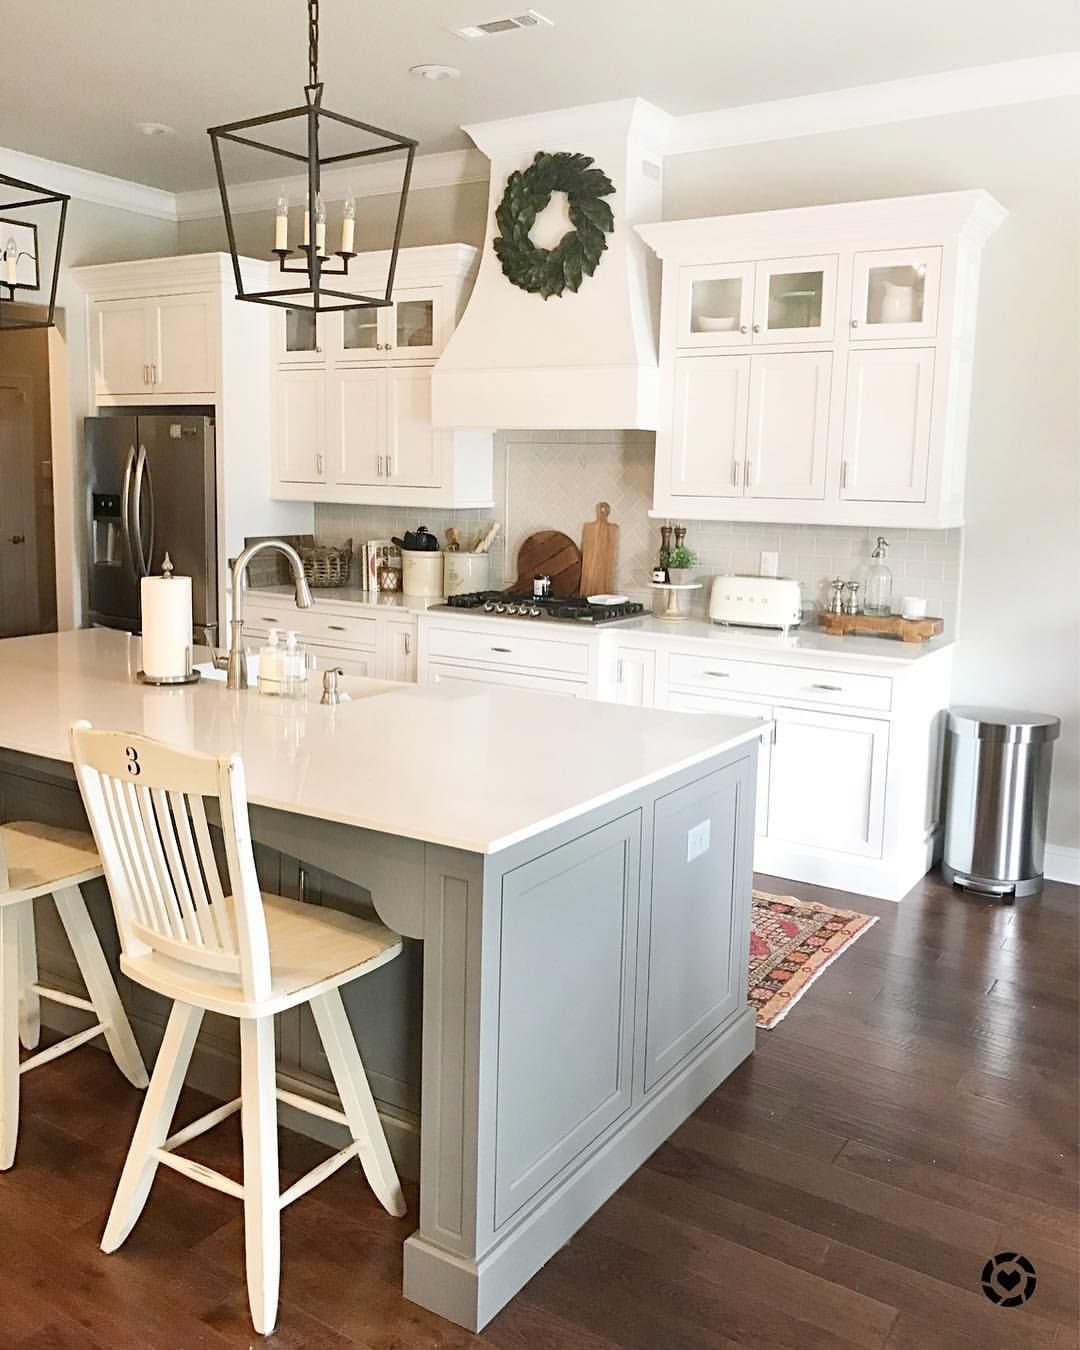 Pin by Maureen Gordanier on Home Improvement | Pinterest | Kitchens